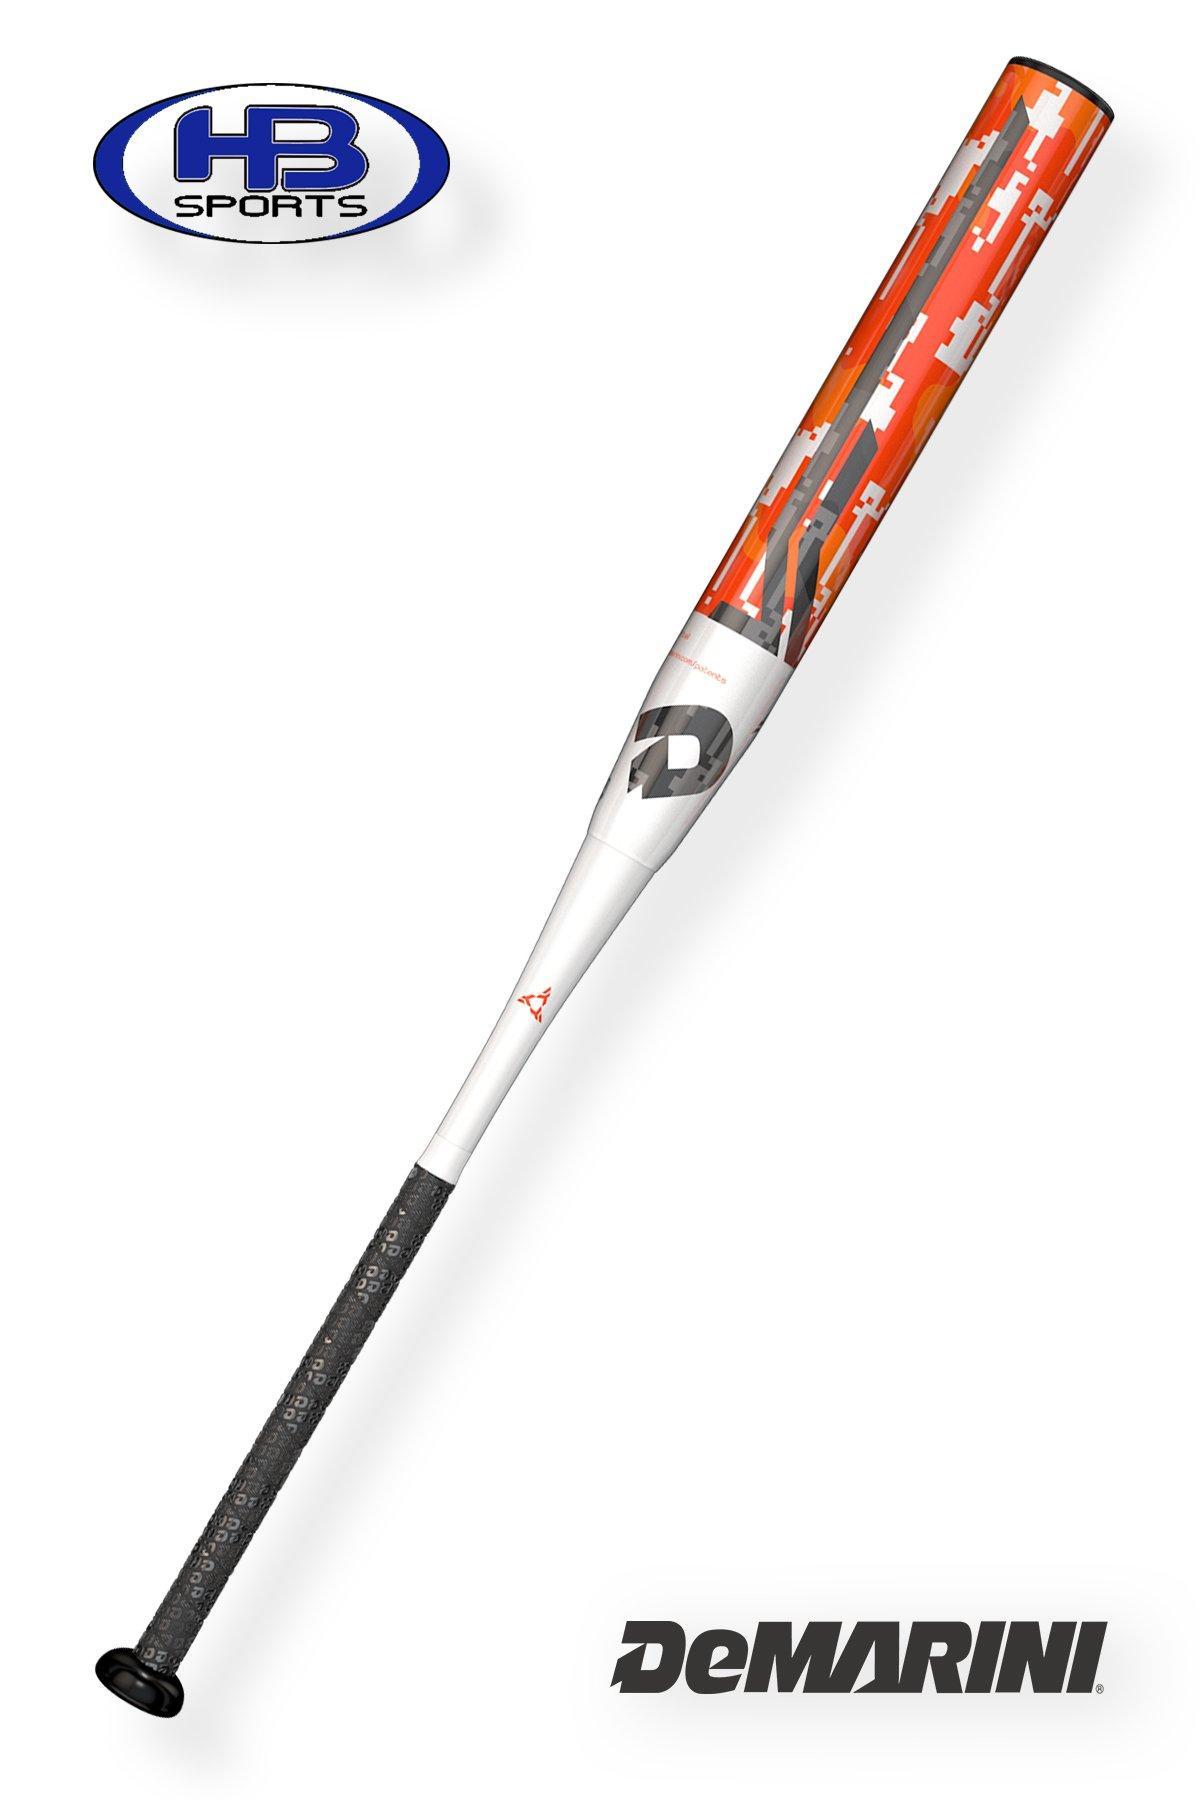 2018 DeMarini Flipper OG ASA Slowpitch Softball Bat: WTDXFLS-18